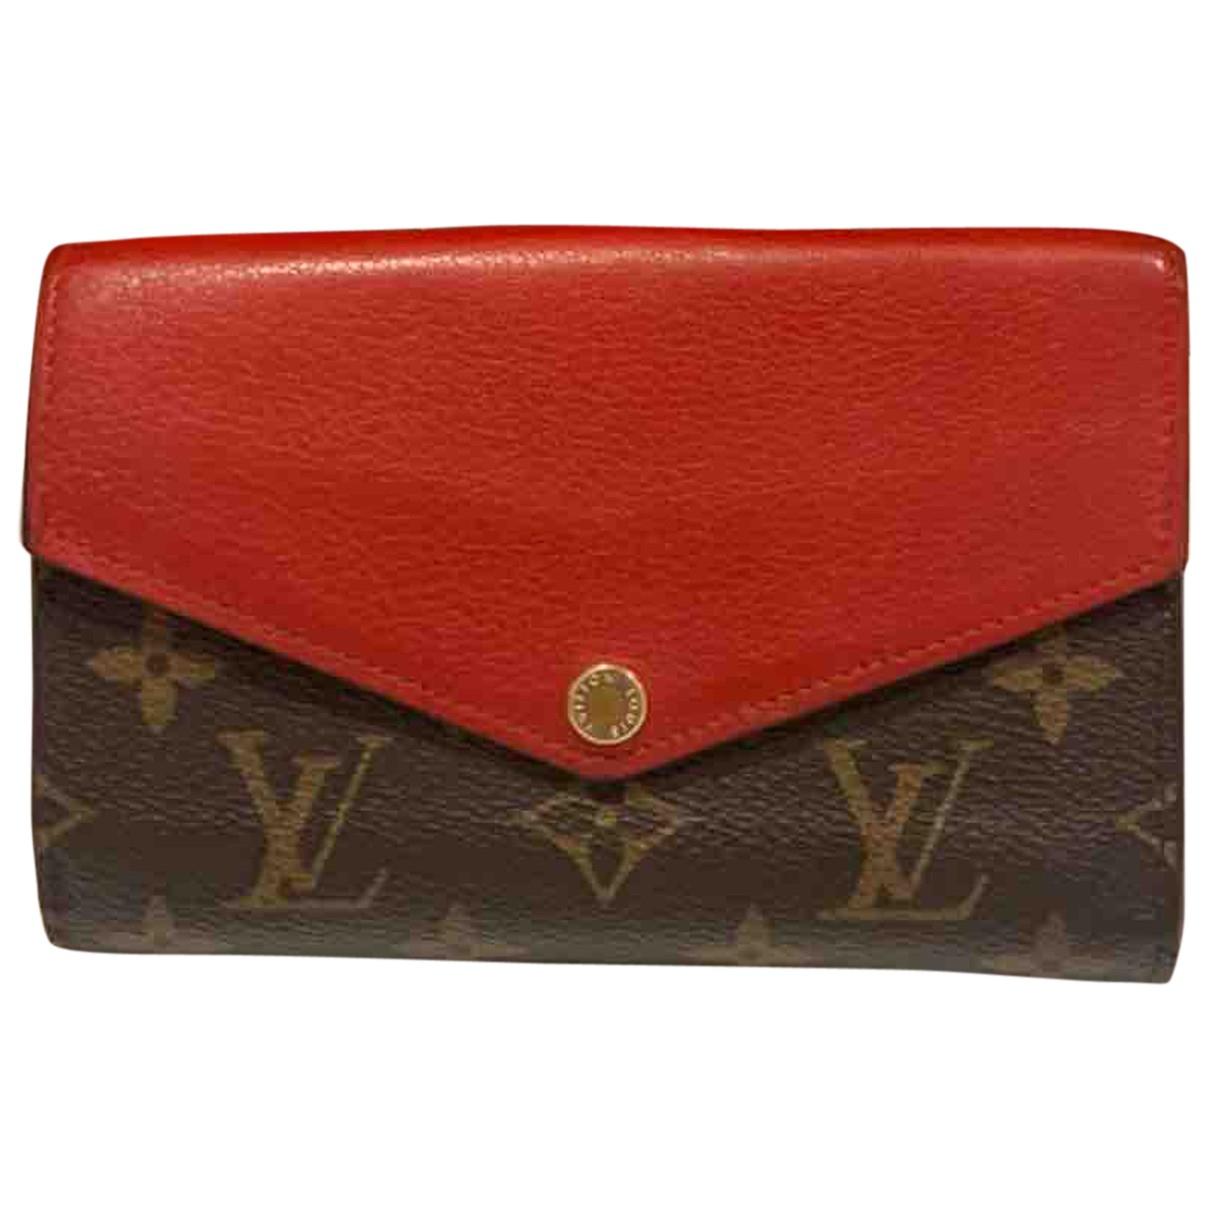 Louis Vuitton Sarah Portemonnaie in  Rot Leinen